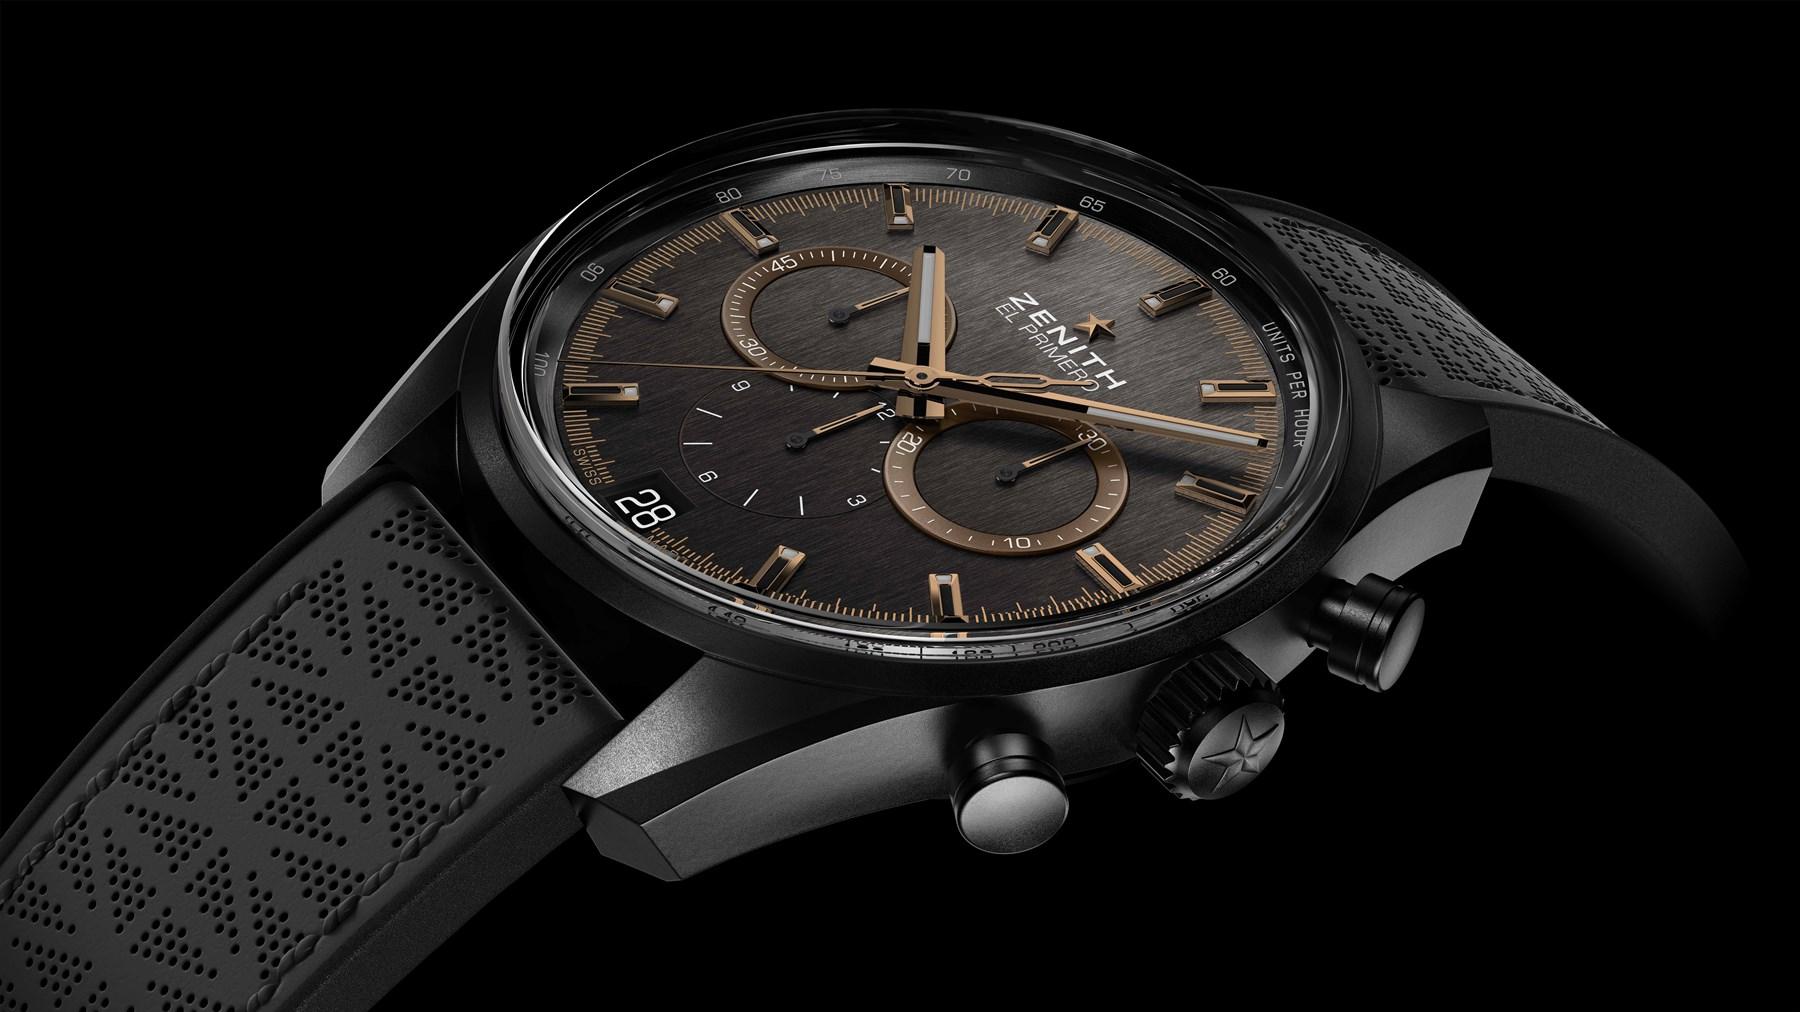 170310new-zenith-chronomaster-range-rover-velar-watch